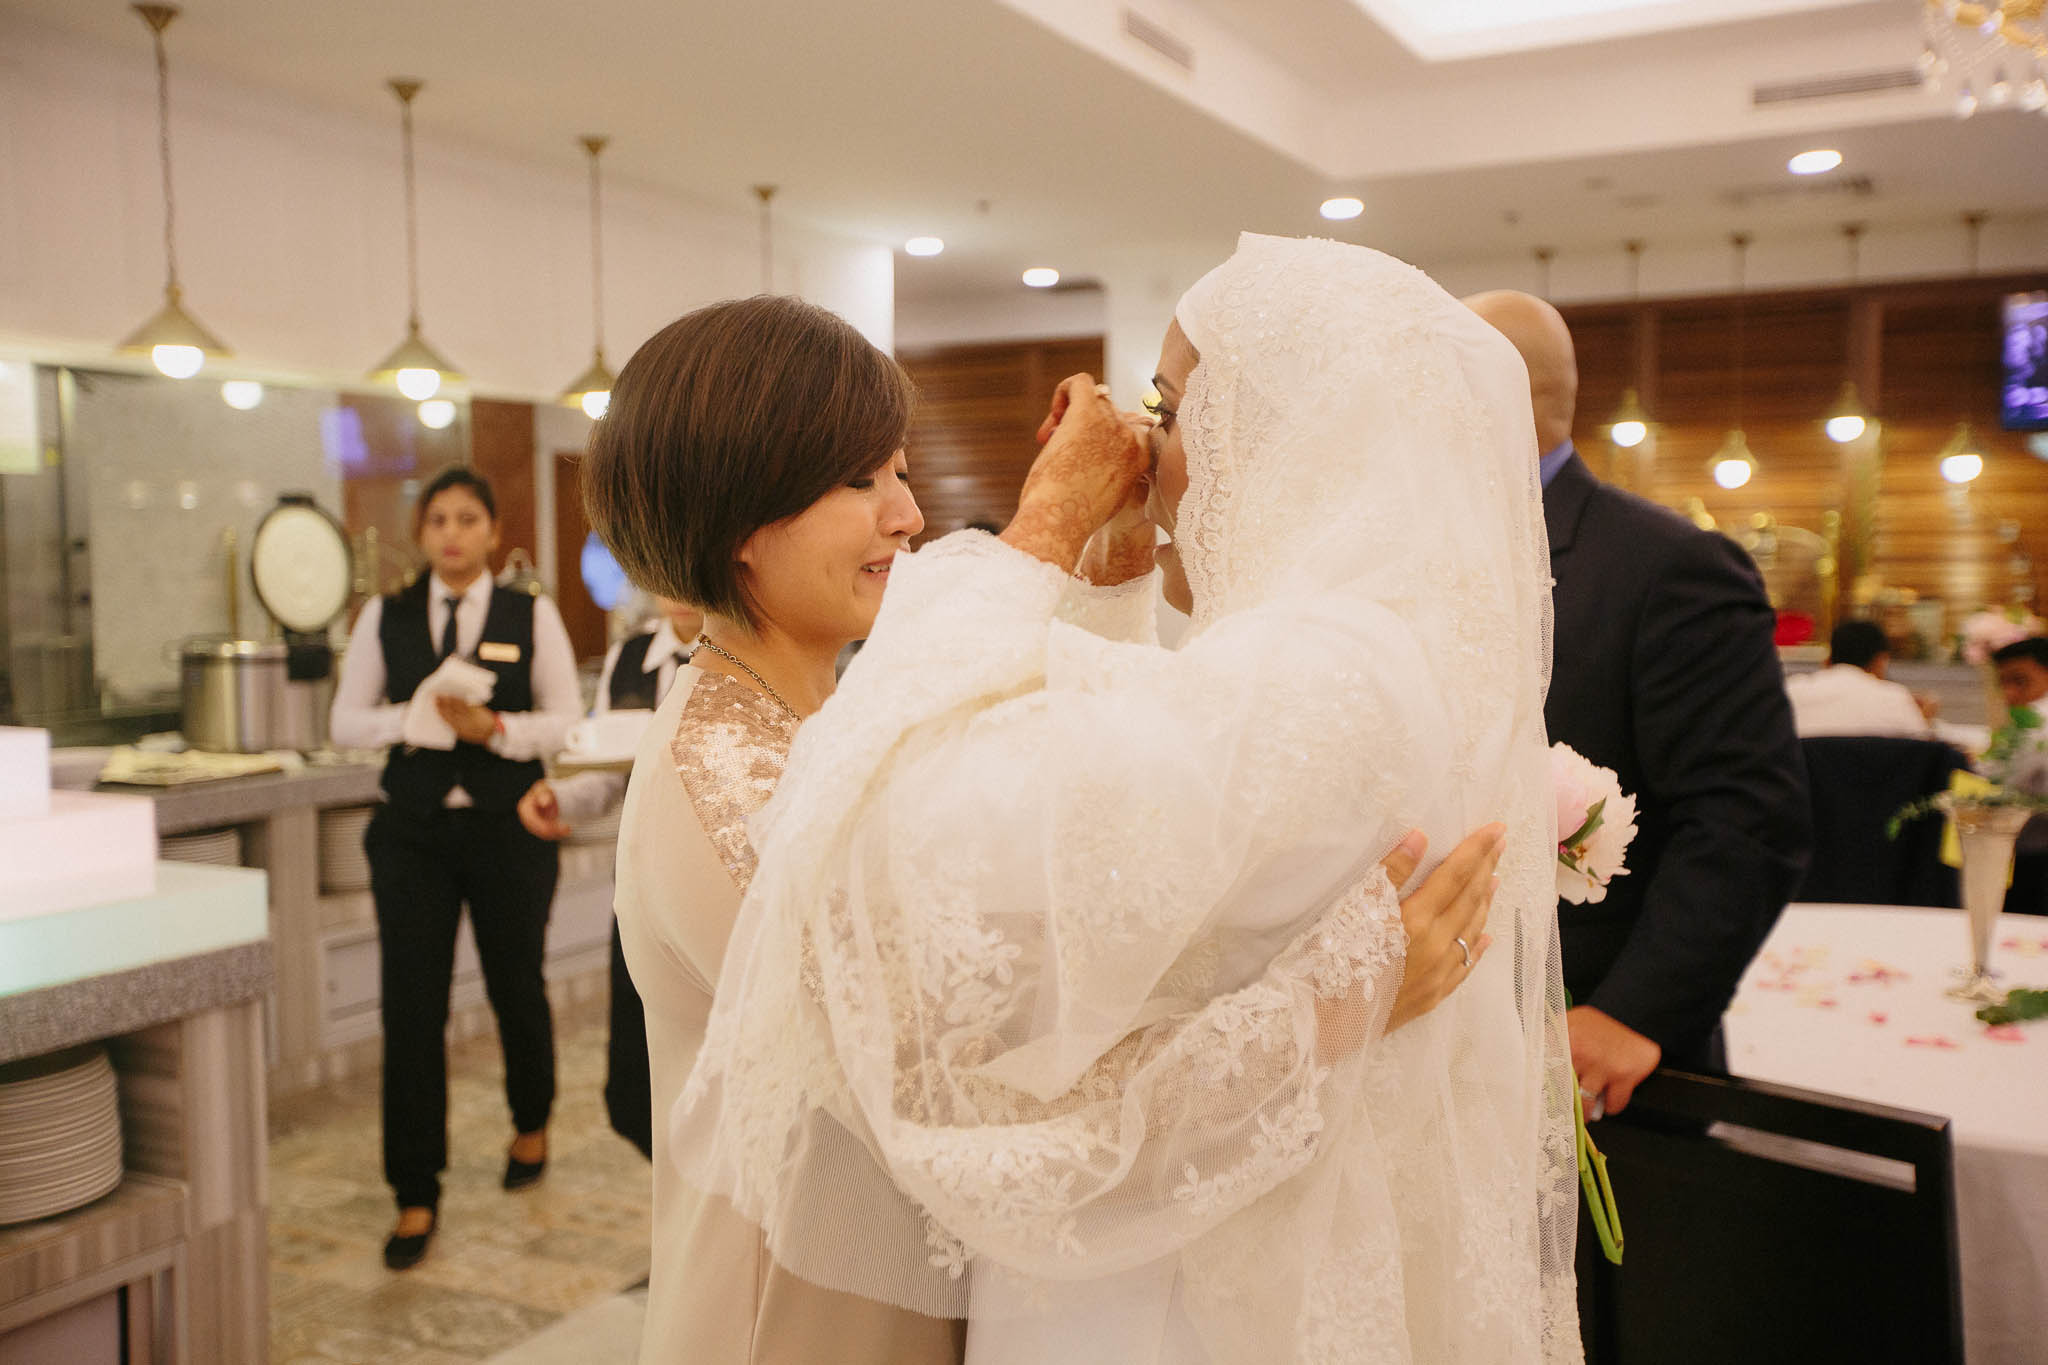 singapore-wedding-photographer-malay-indian-pre-wedding-travel-wmt-2015-shereen-farid-70.jpg